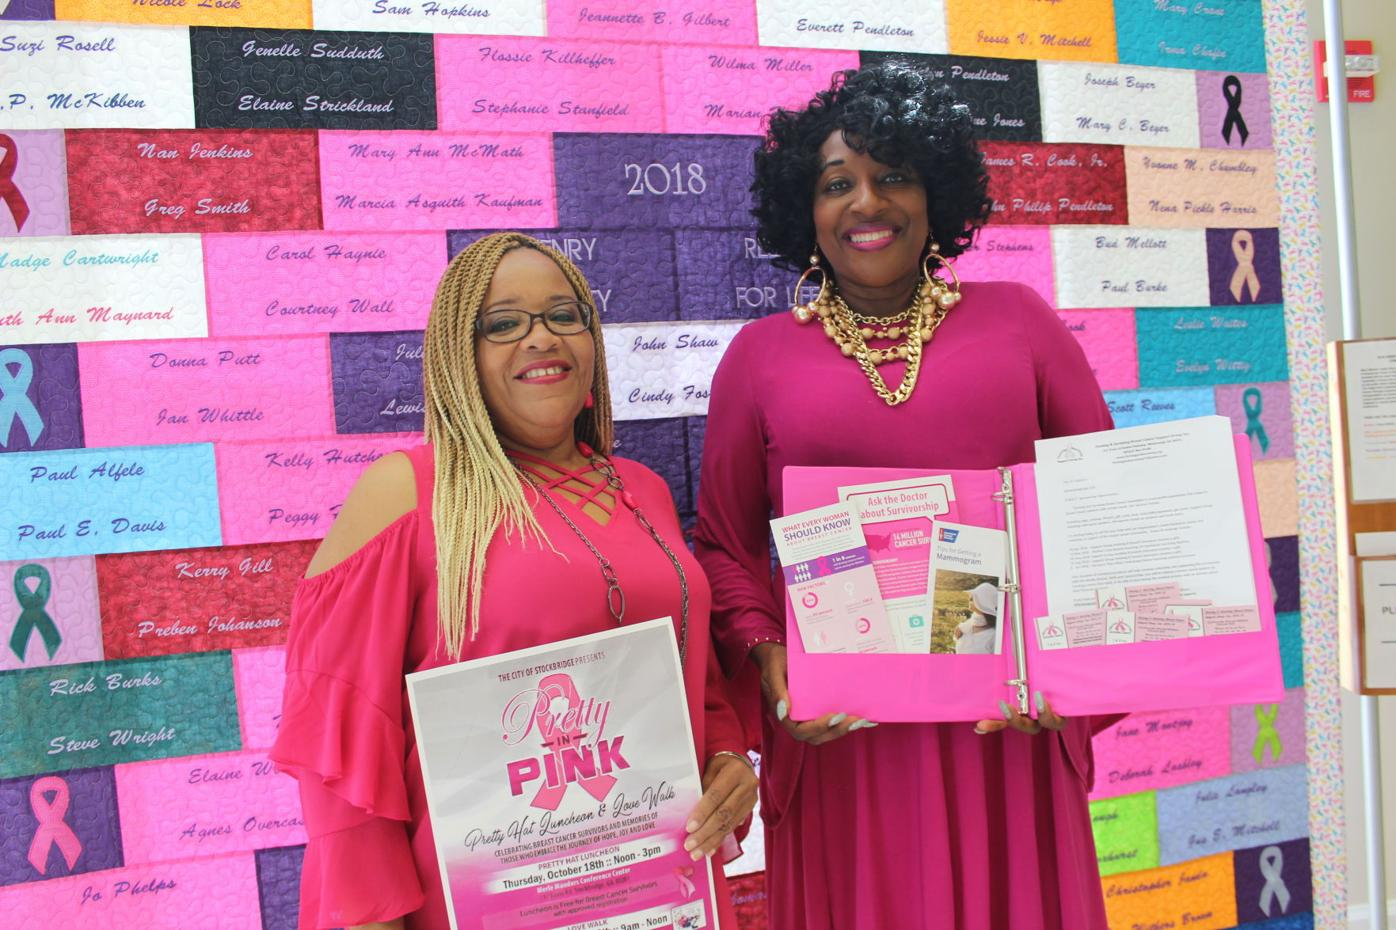 Cie Cie Wilson McGhee and Rhonda Williams